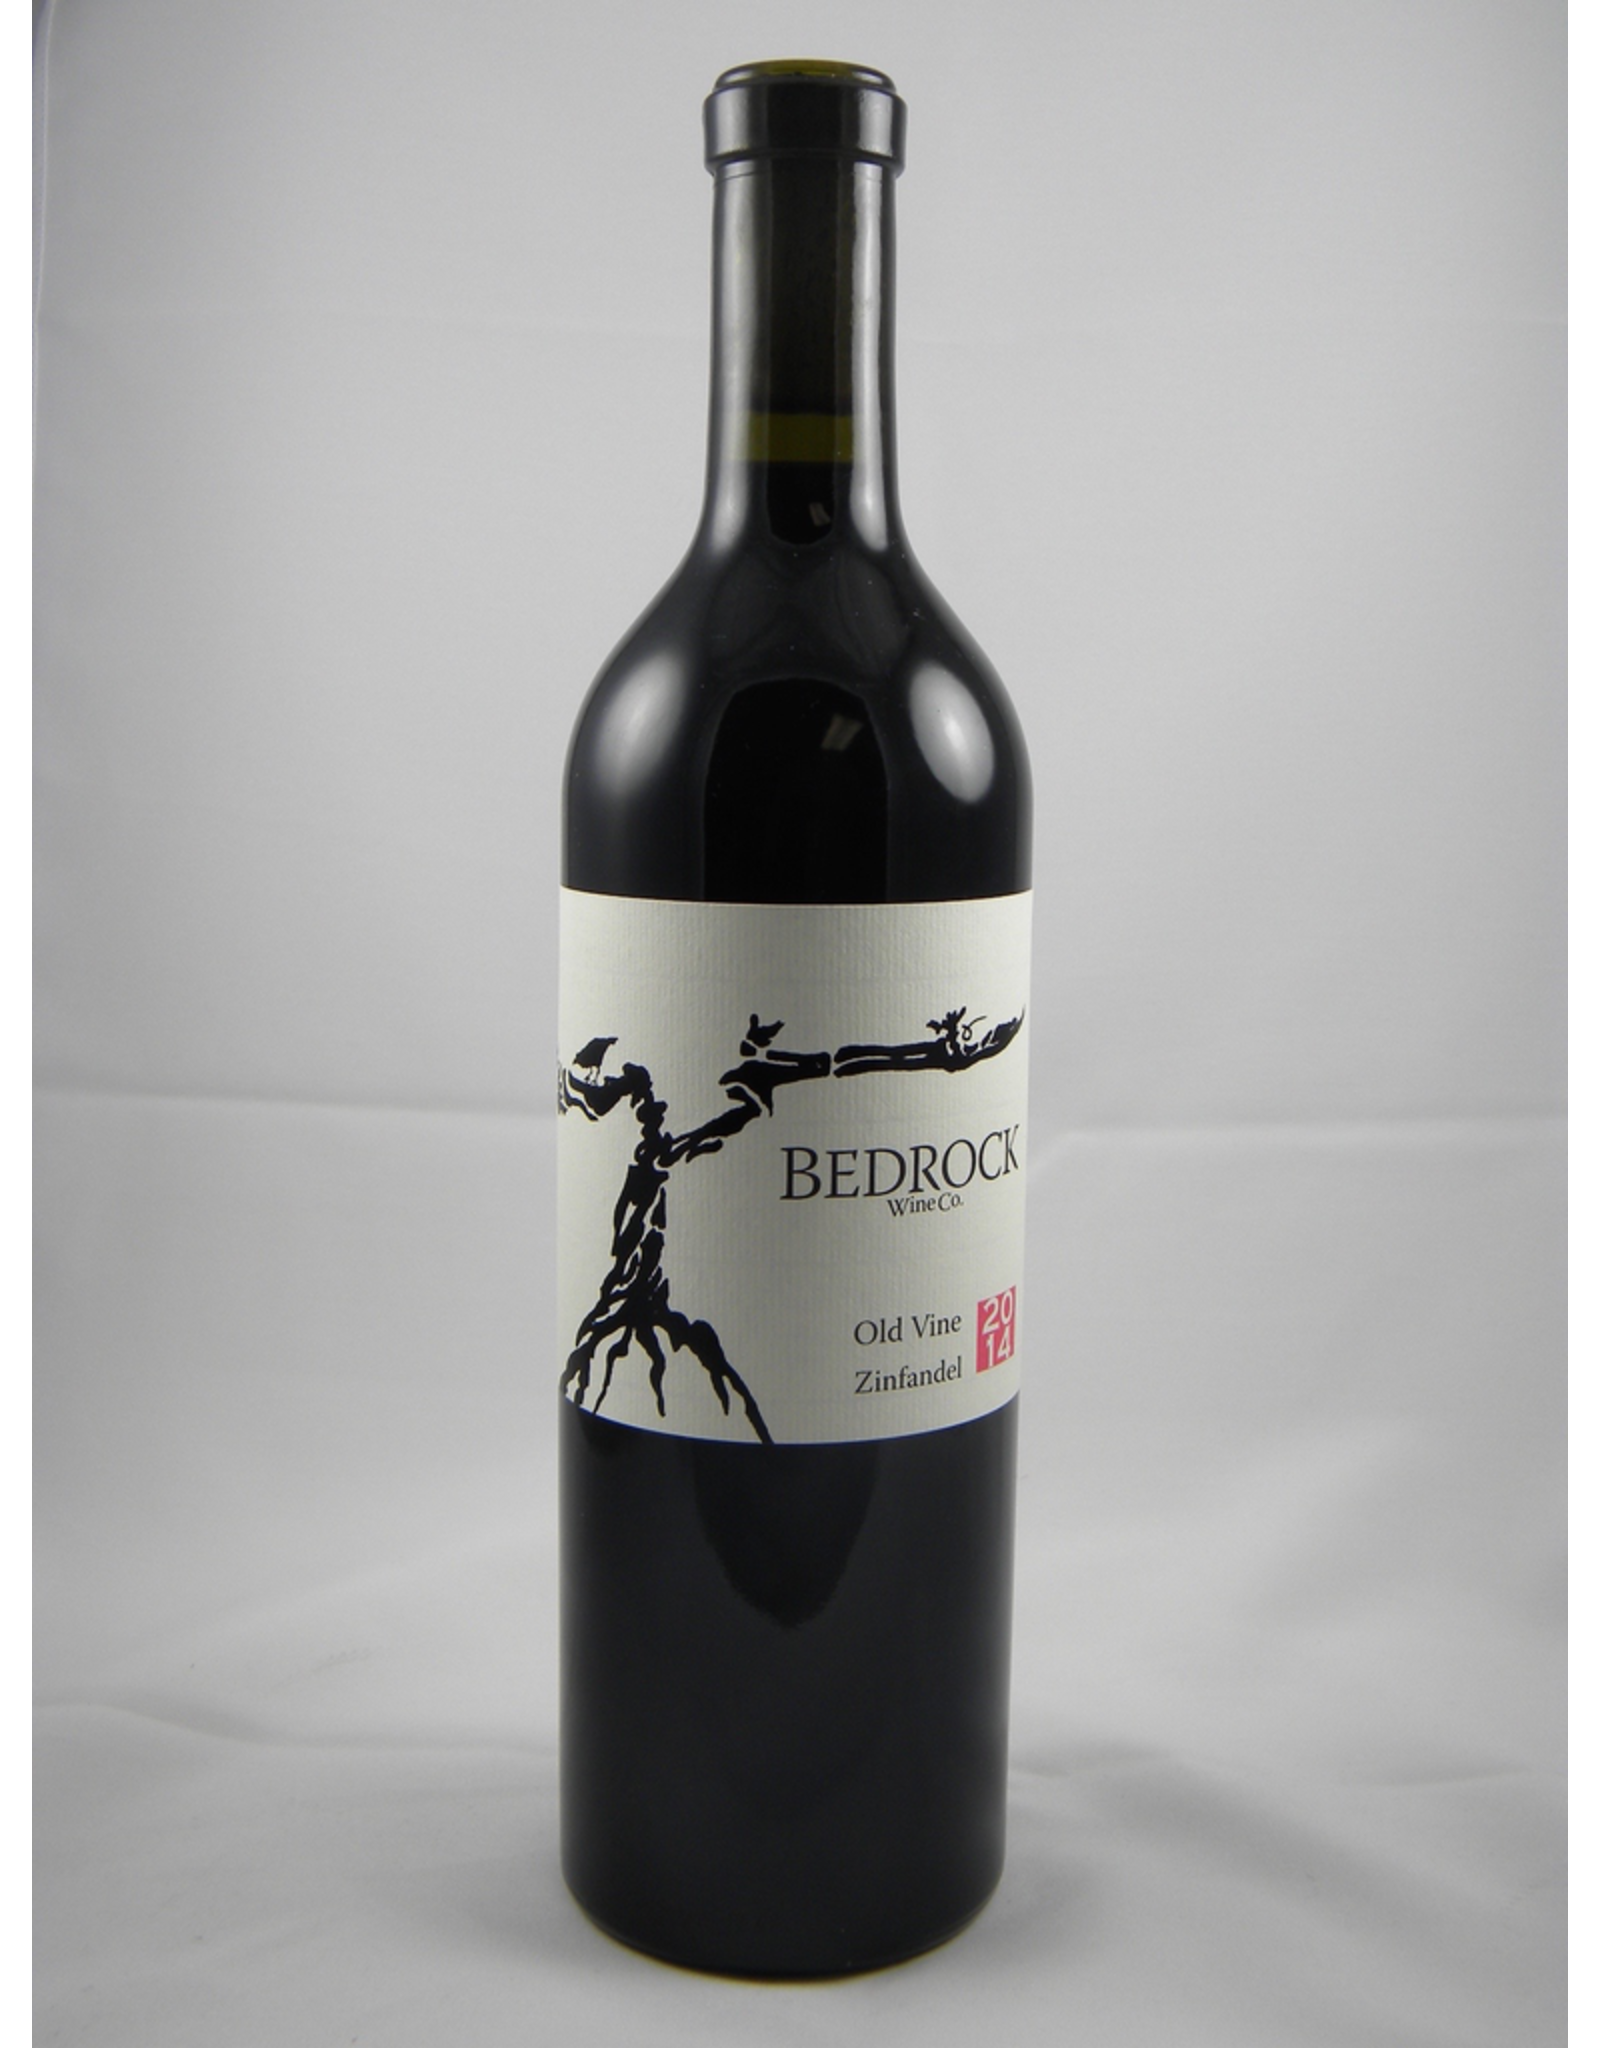 Bedrock Bedrock Wine Co Red Sonoma Bedrock Heritage 2019